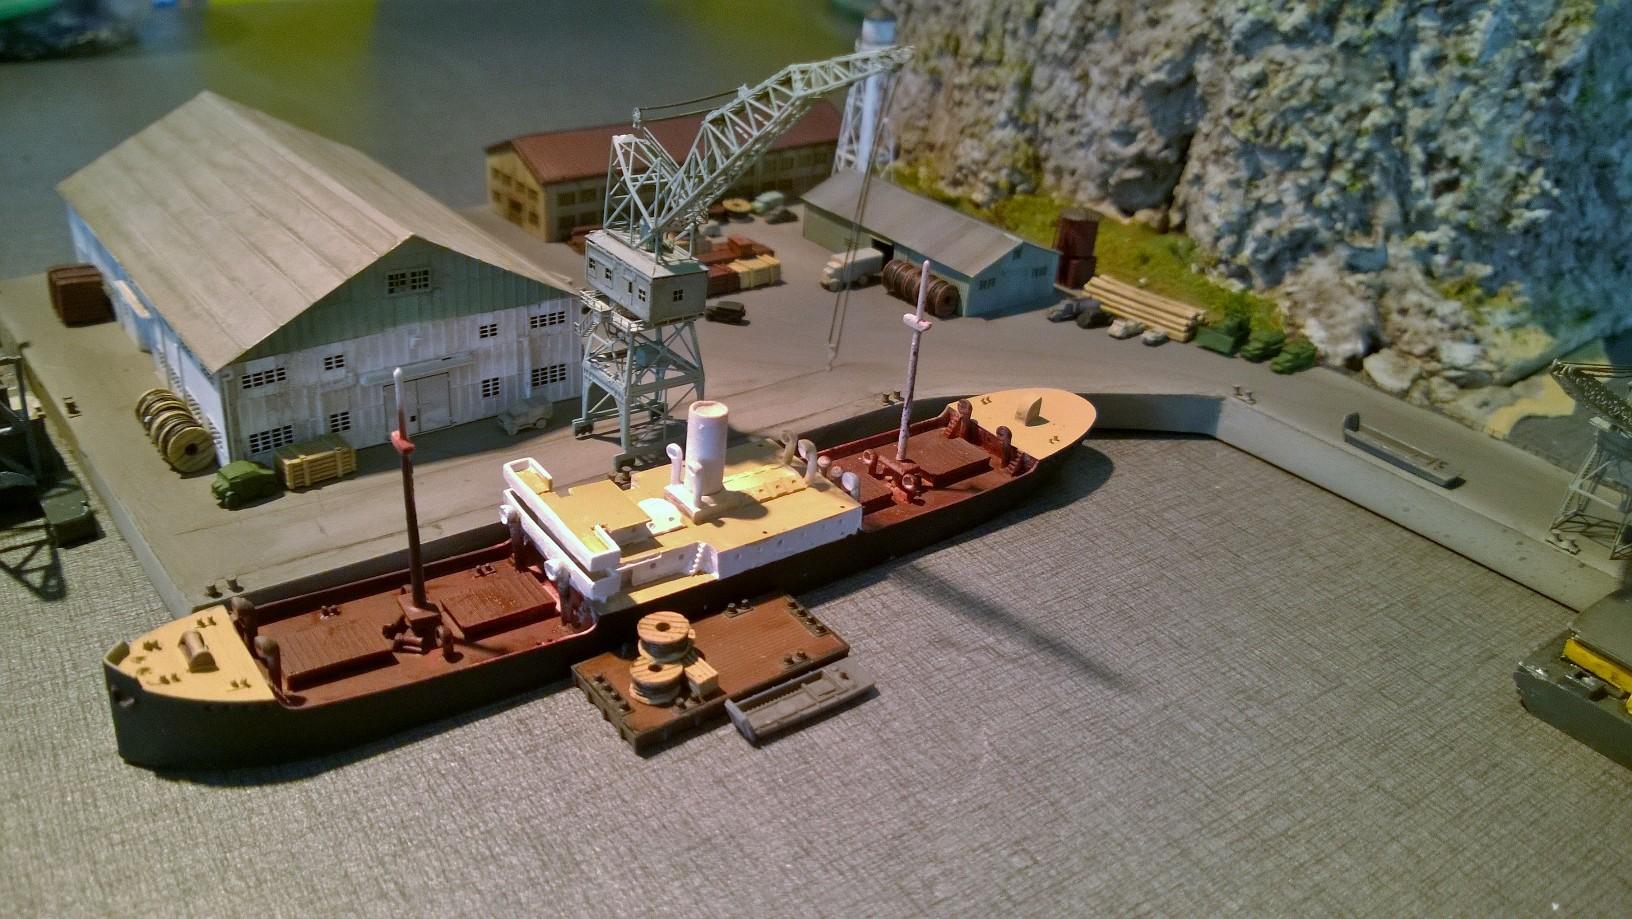 Diorama base navale 1/700 par Nesquik - Page 3 5jvpWCK0HP